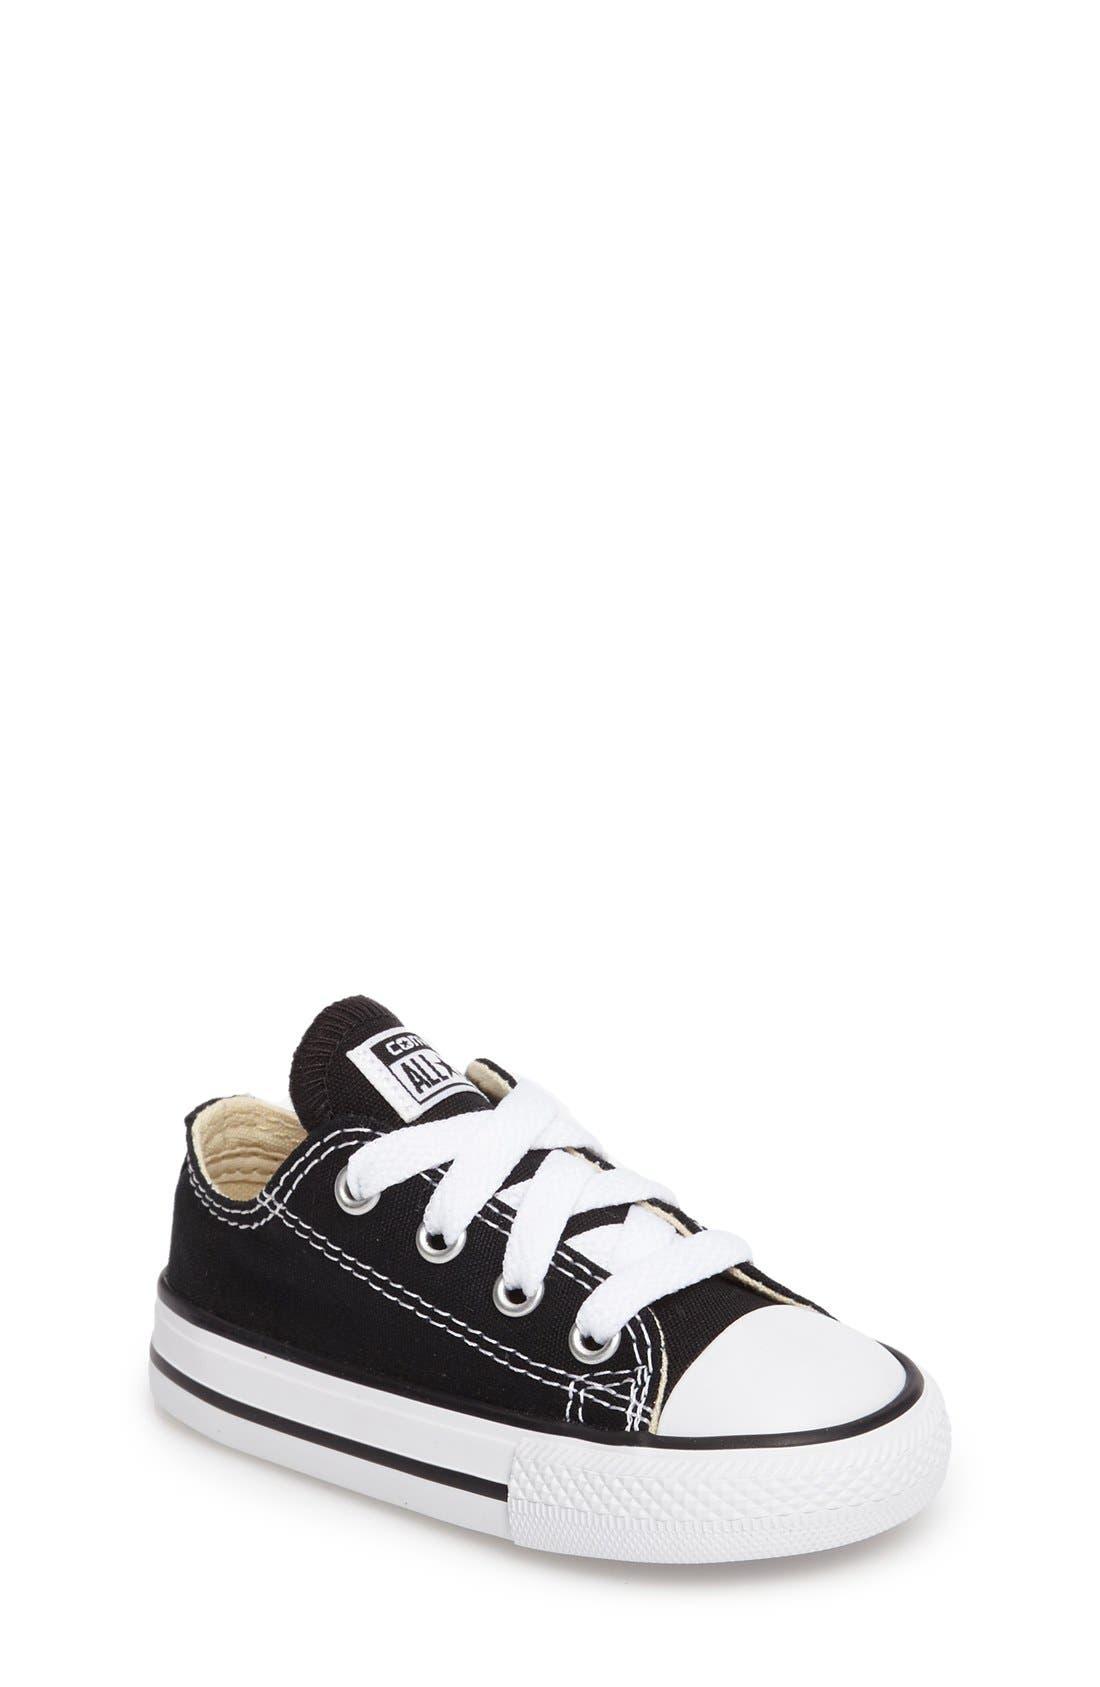 CONVERSE,                             Chuck Taylor<sup>®</sup> Low Top Sneaker,                             Main thumbnail 1, color,                             BLACK